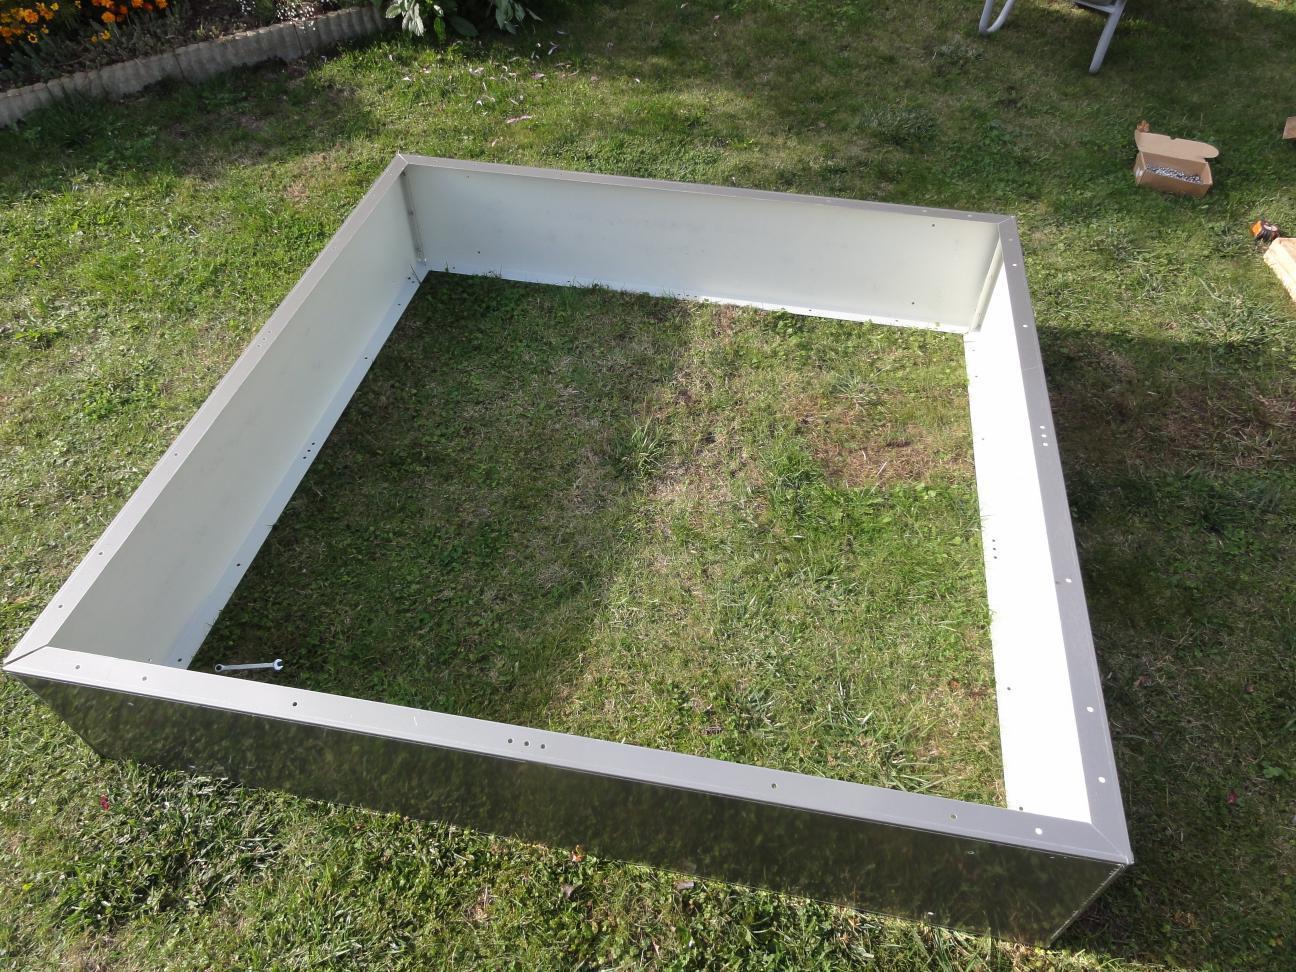 kaminholzregal metall 1 9 m x 1 5 m lackiert. Black Bedroom Furniture Sets. Home Design Ideas